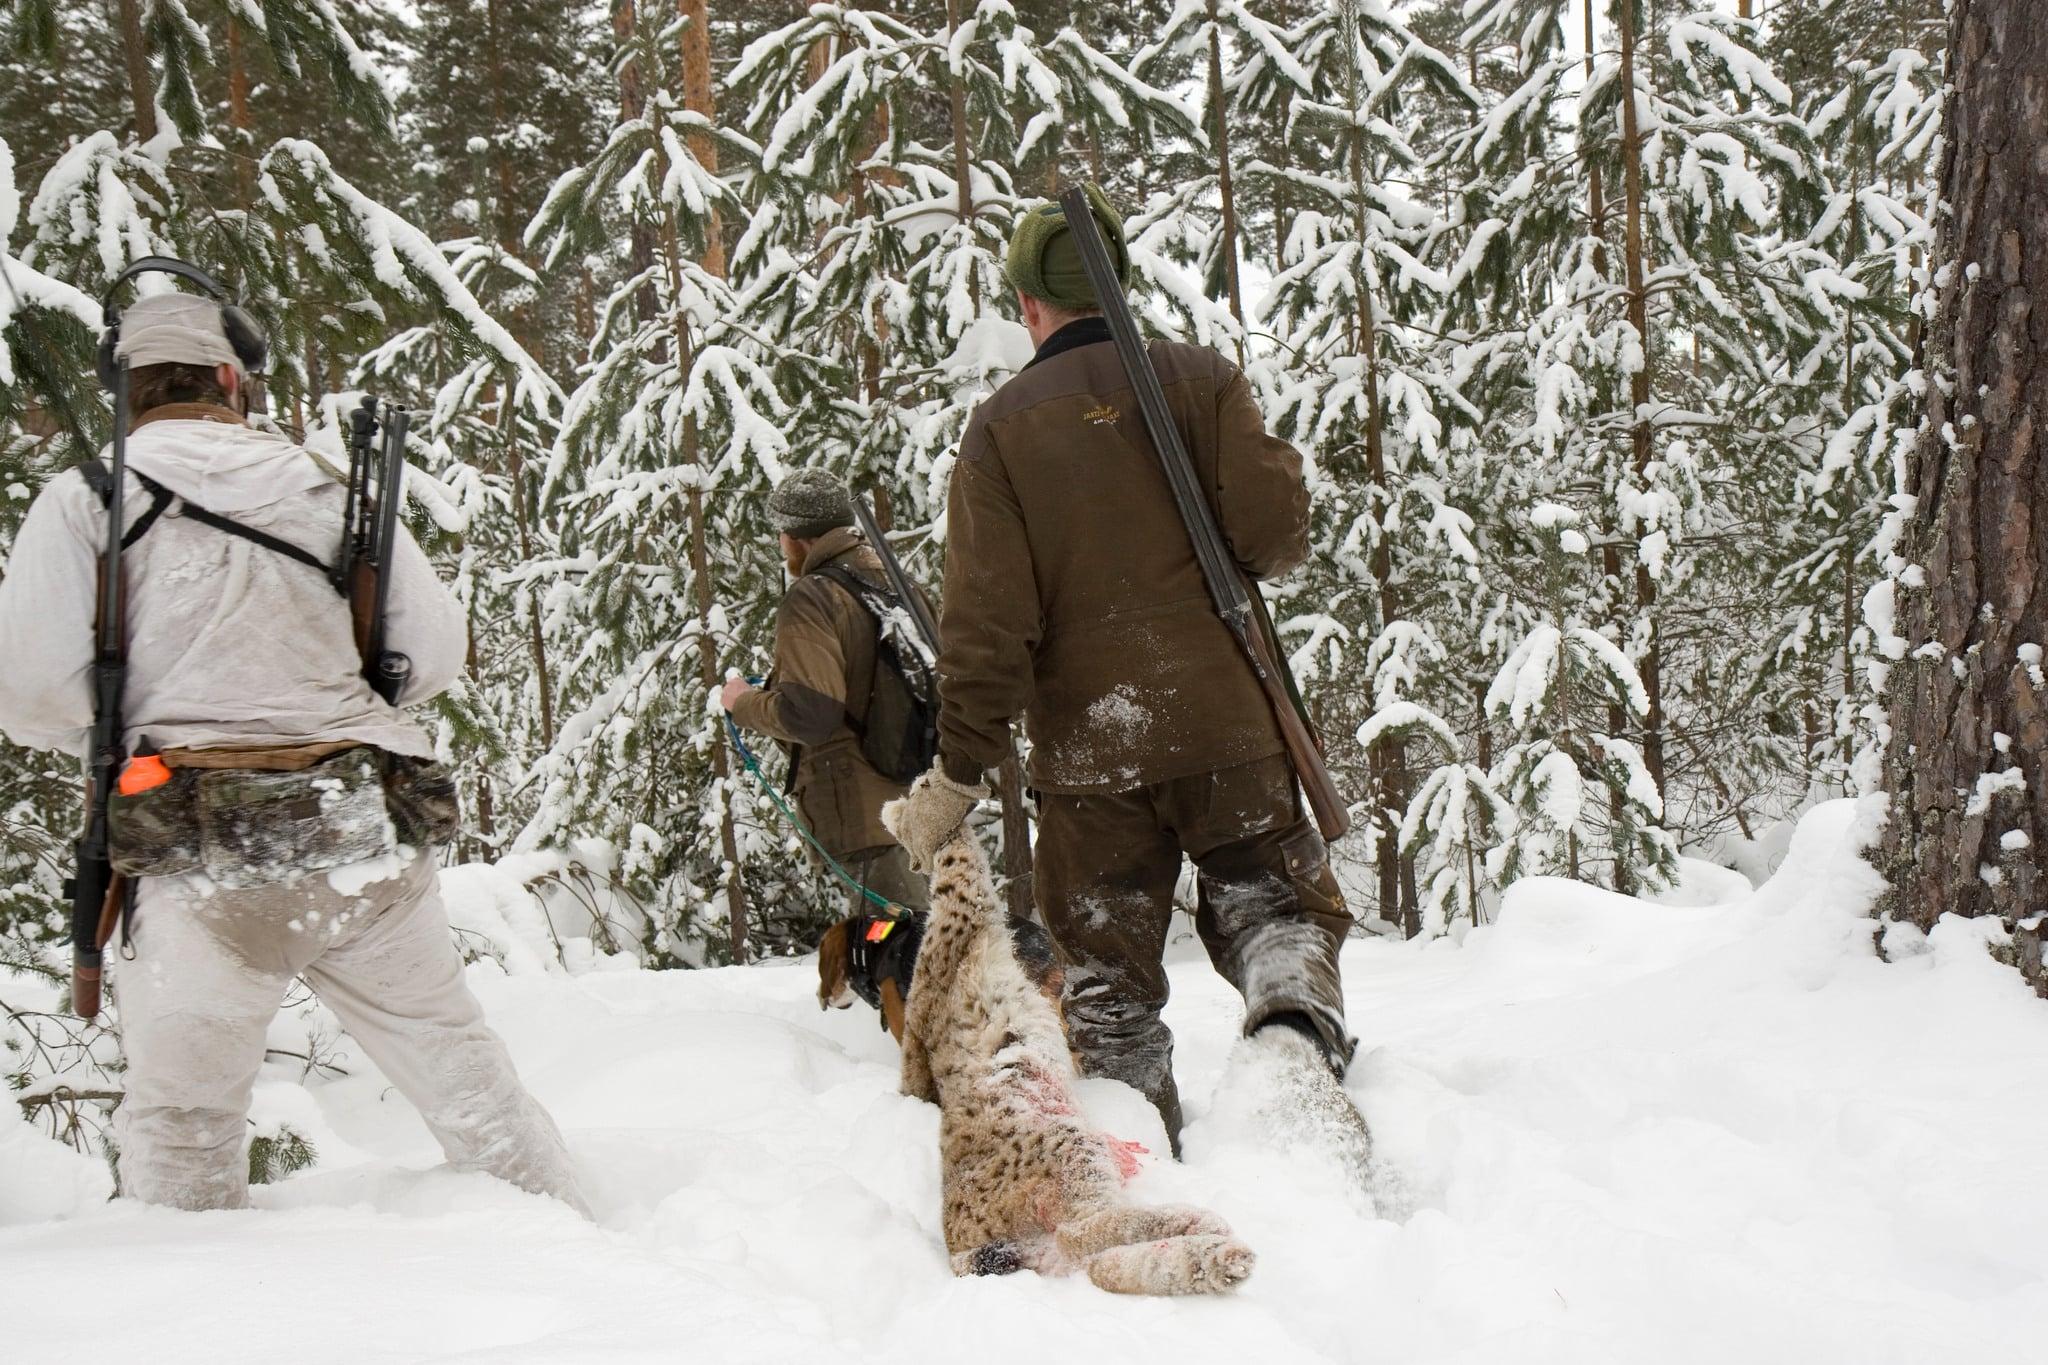 Lodjursjakten i Norrbotten överklagas av Wolf Association Sweden. Foto: Olle Olsson